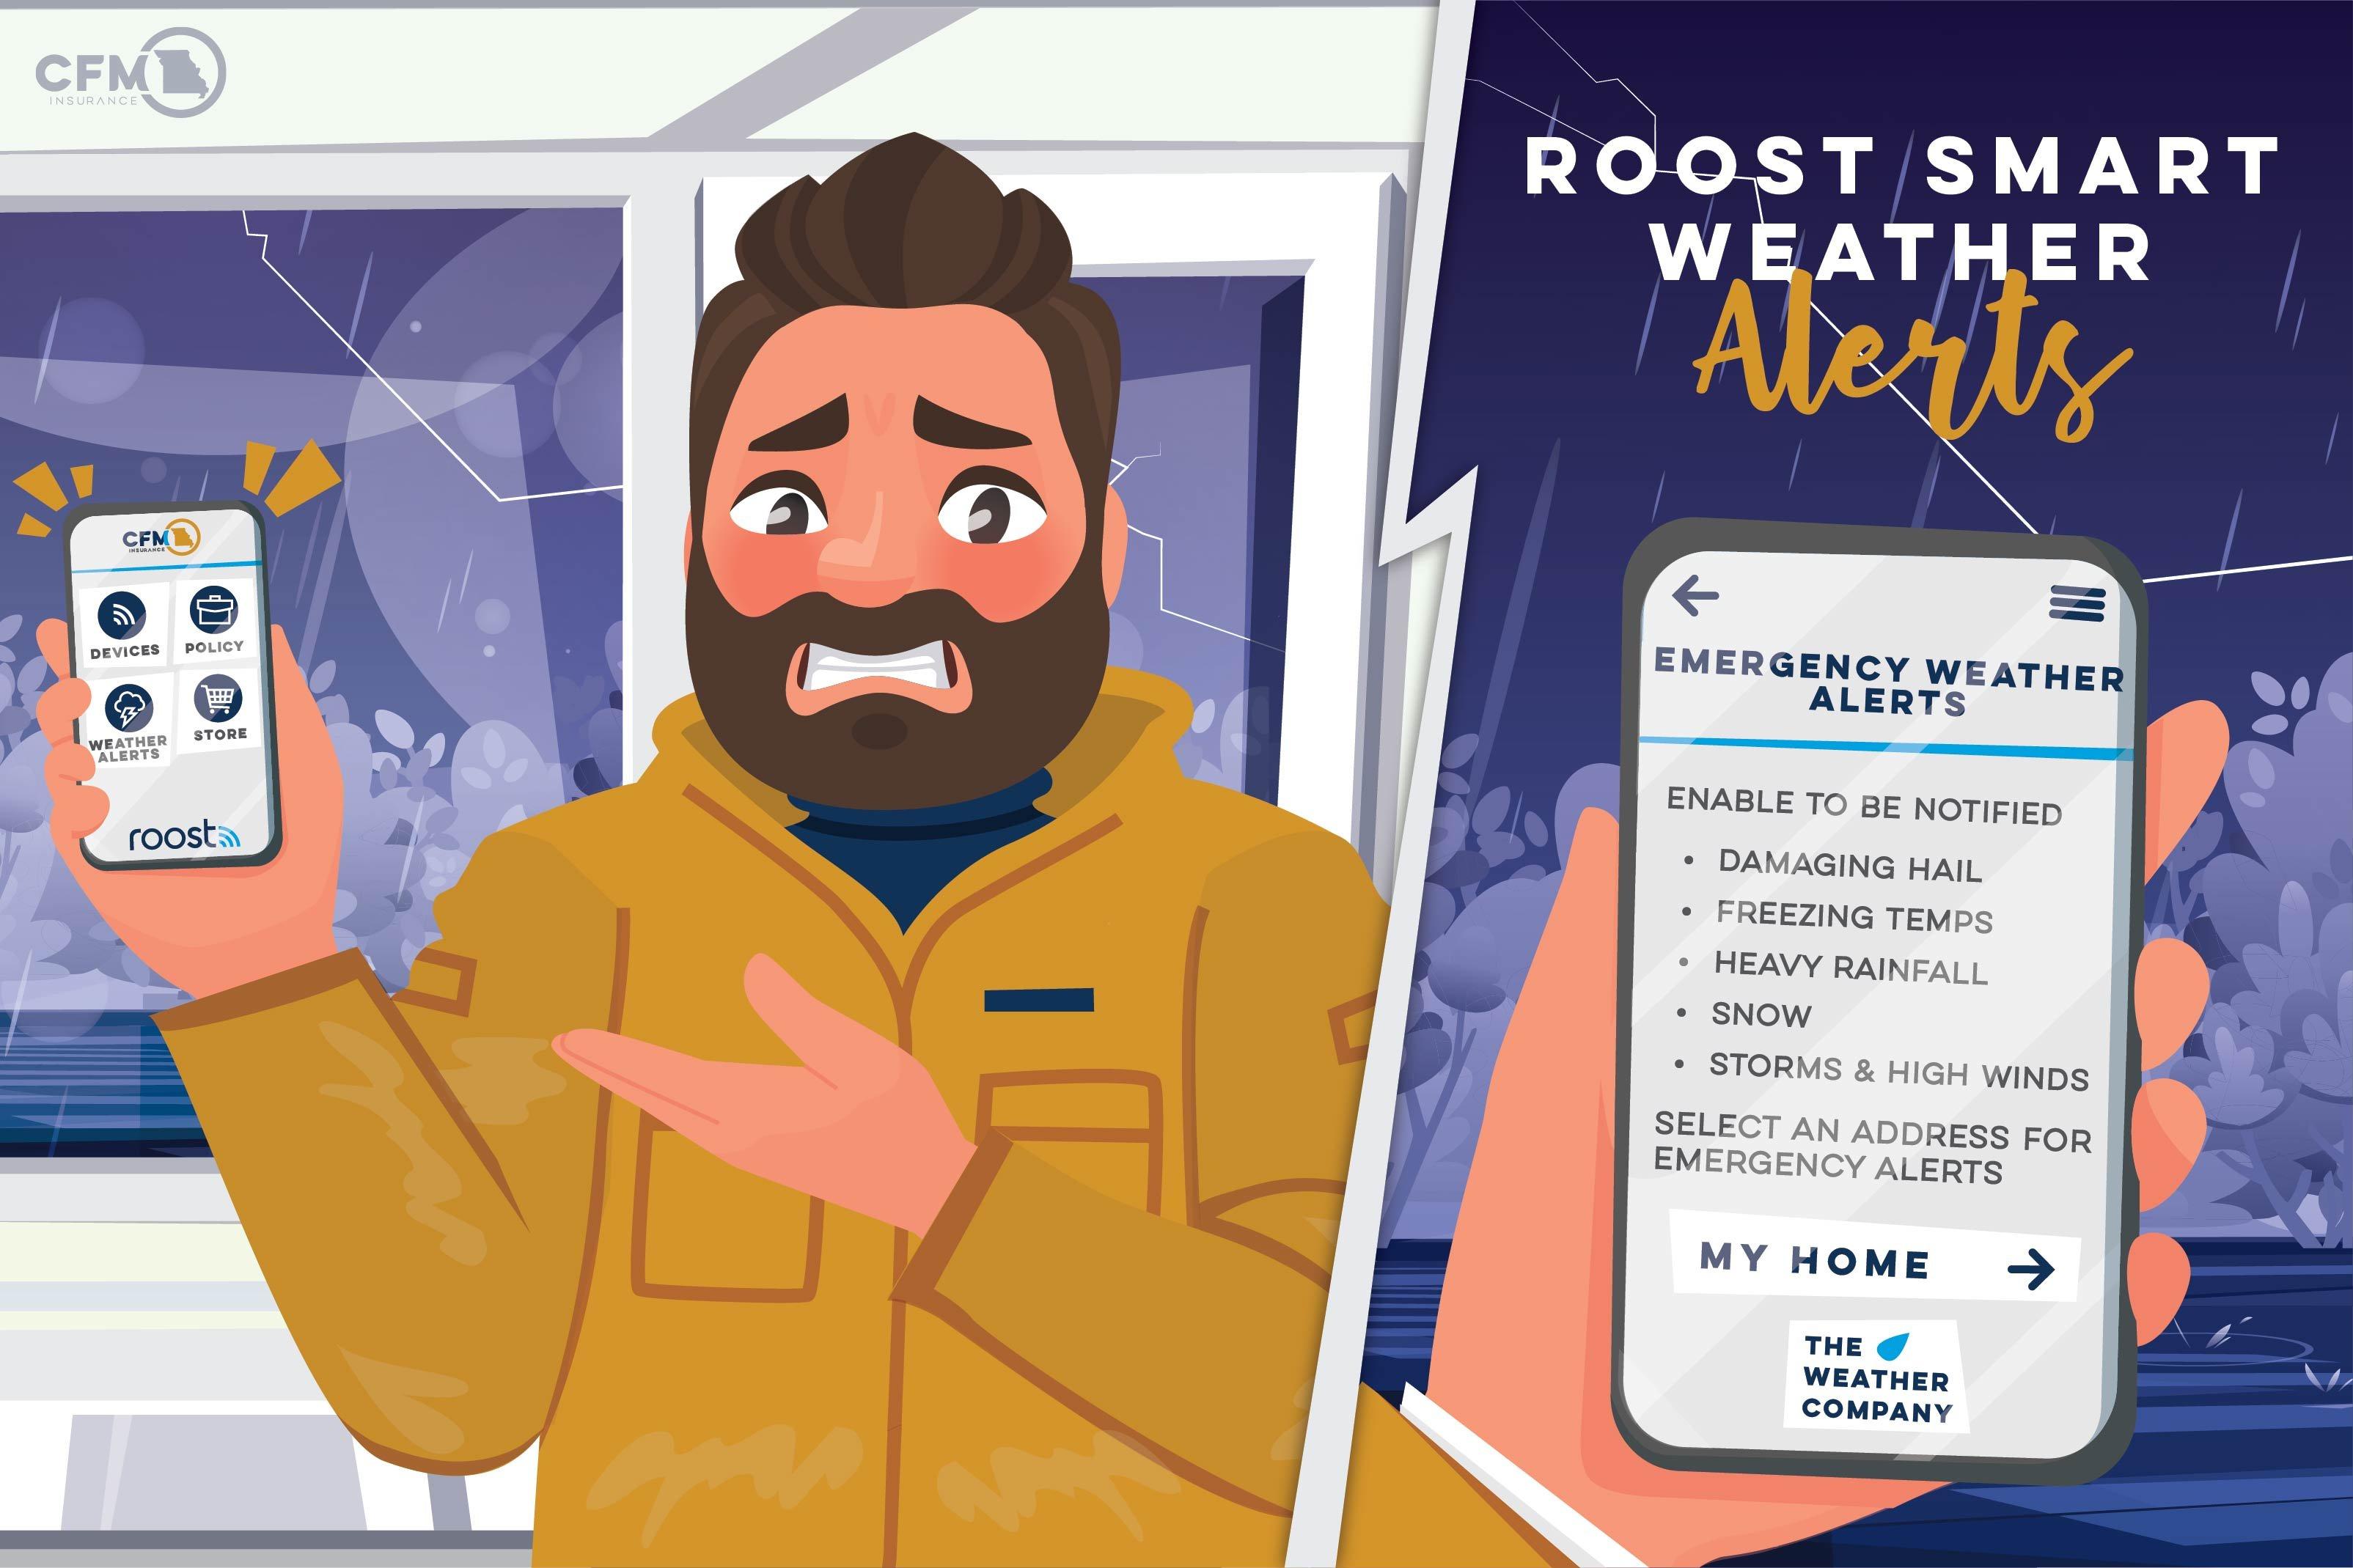 8. 4301A_Roost Smart Weather Alerts_Storm_Blog-01